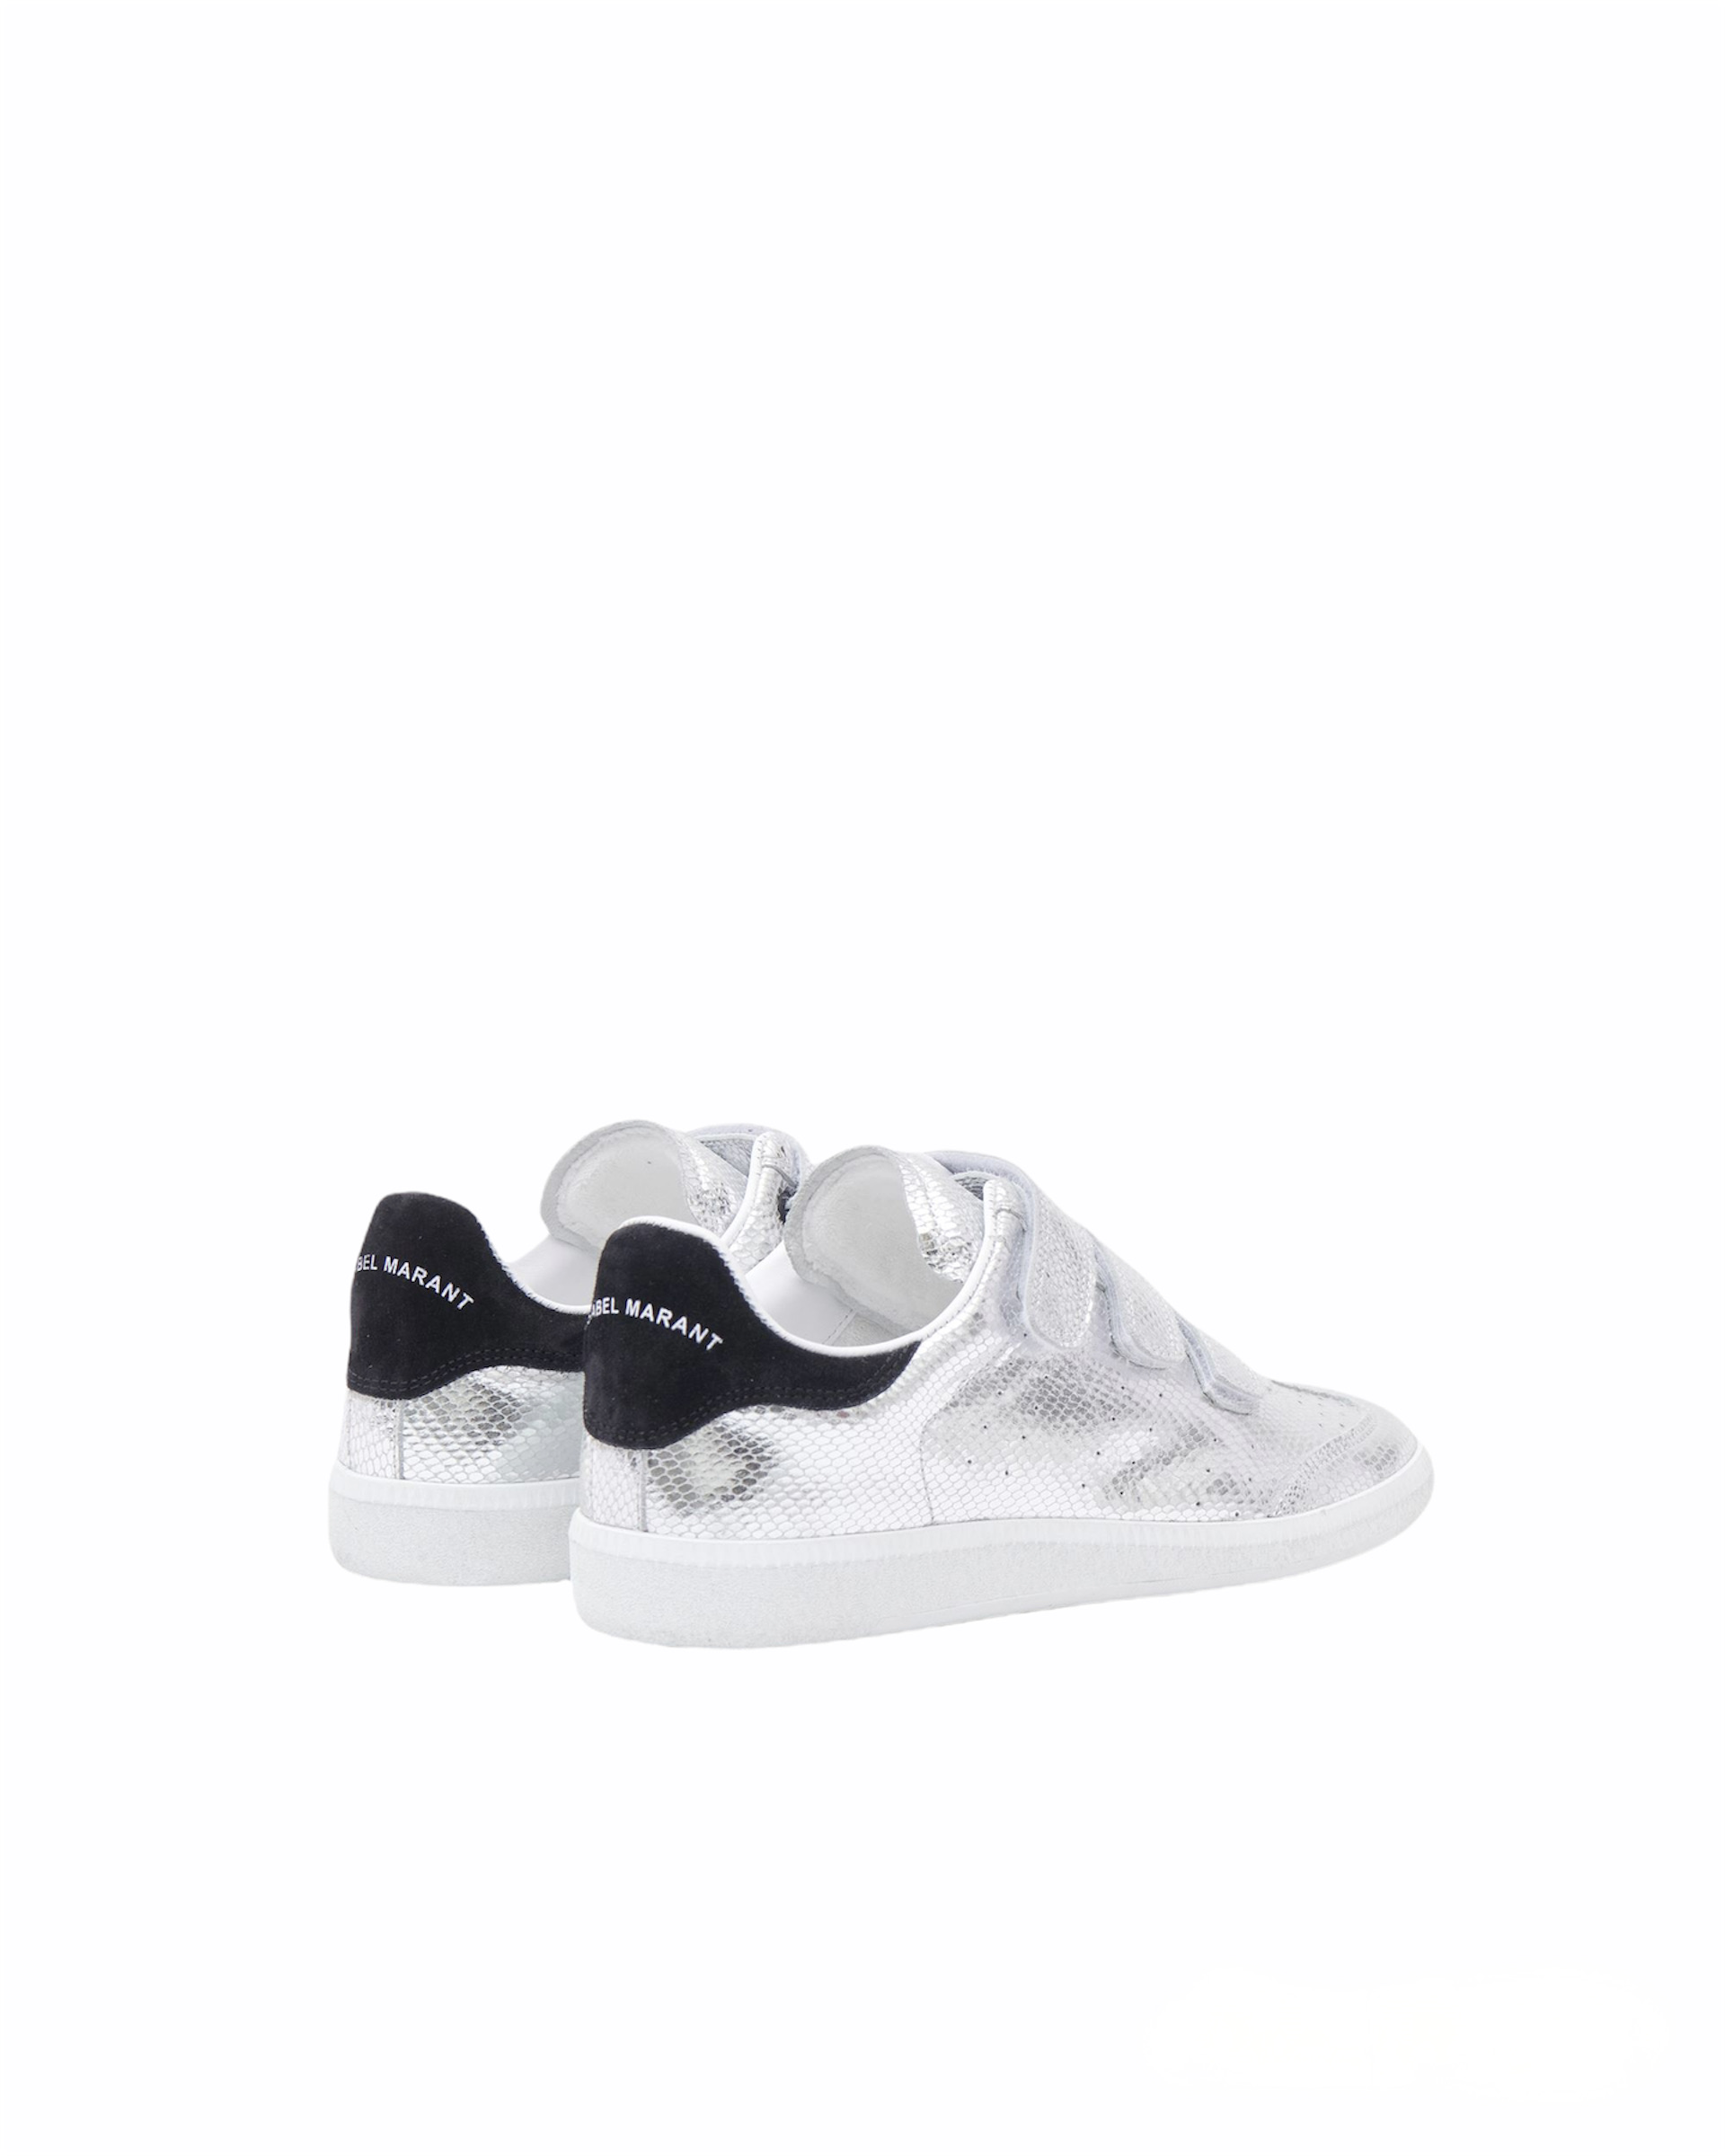 21H021S BETH, Sneaker, Isabel Marant,